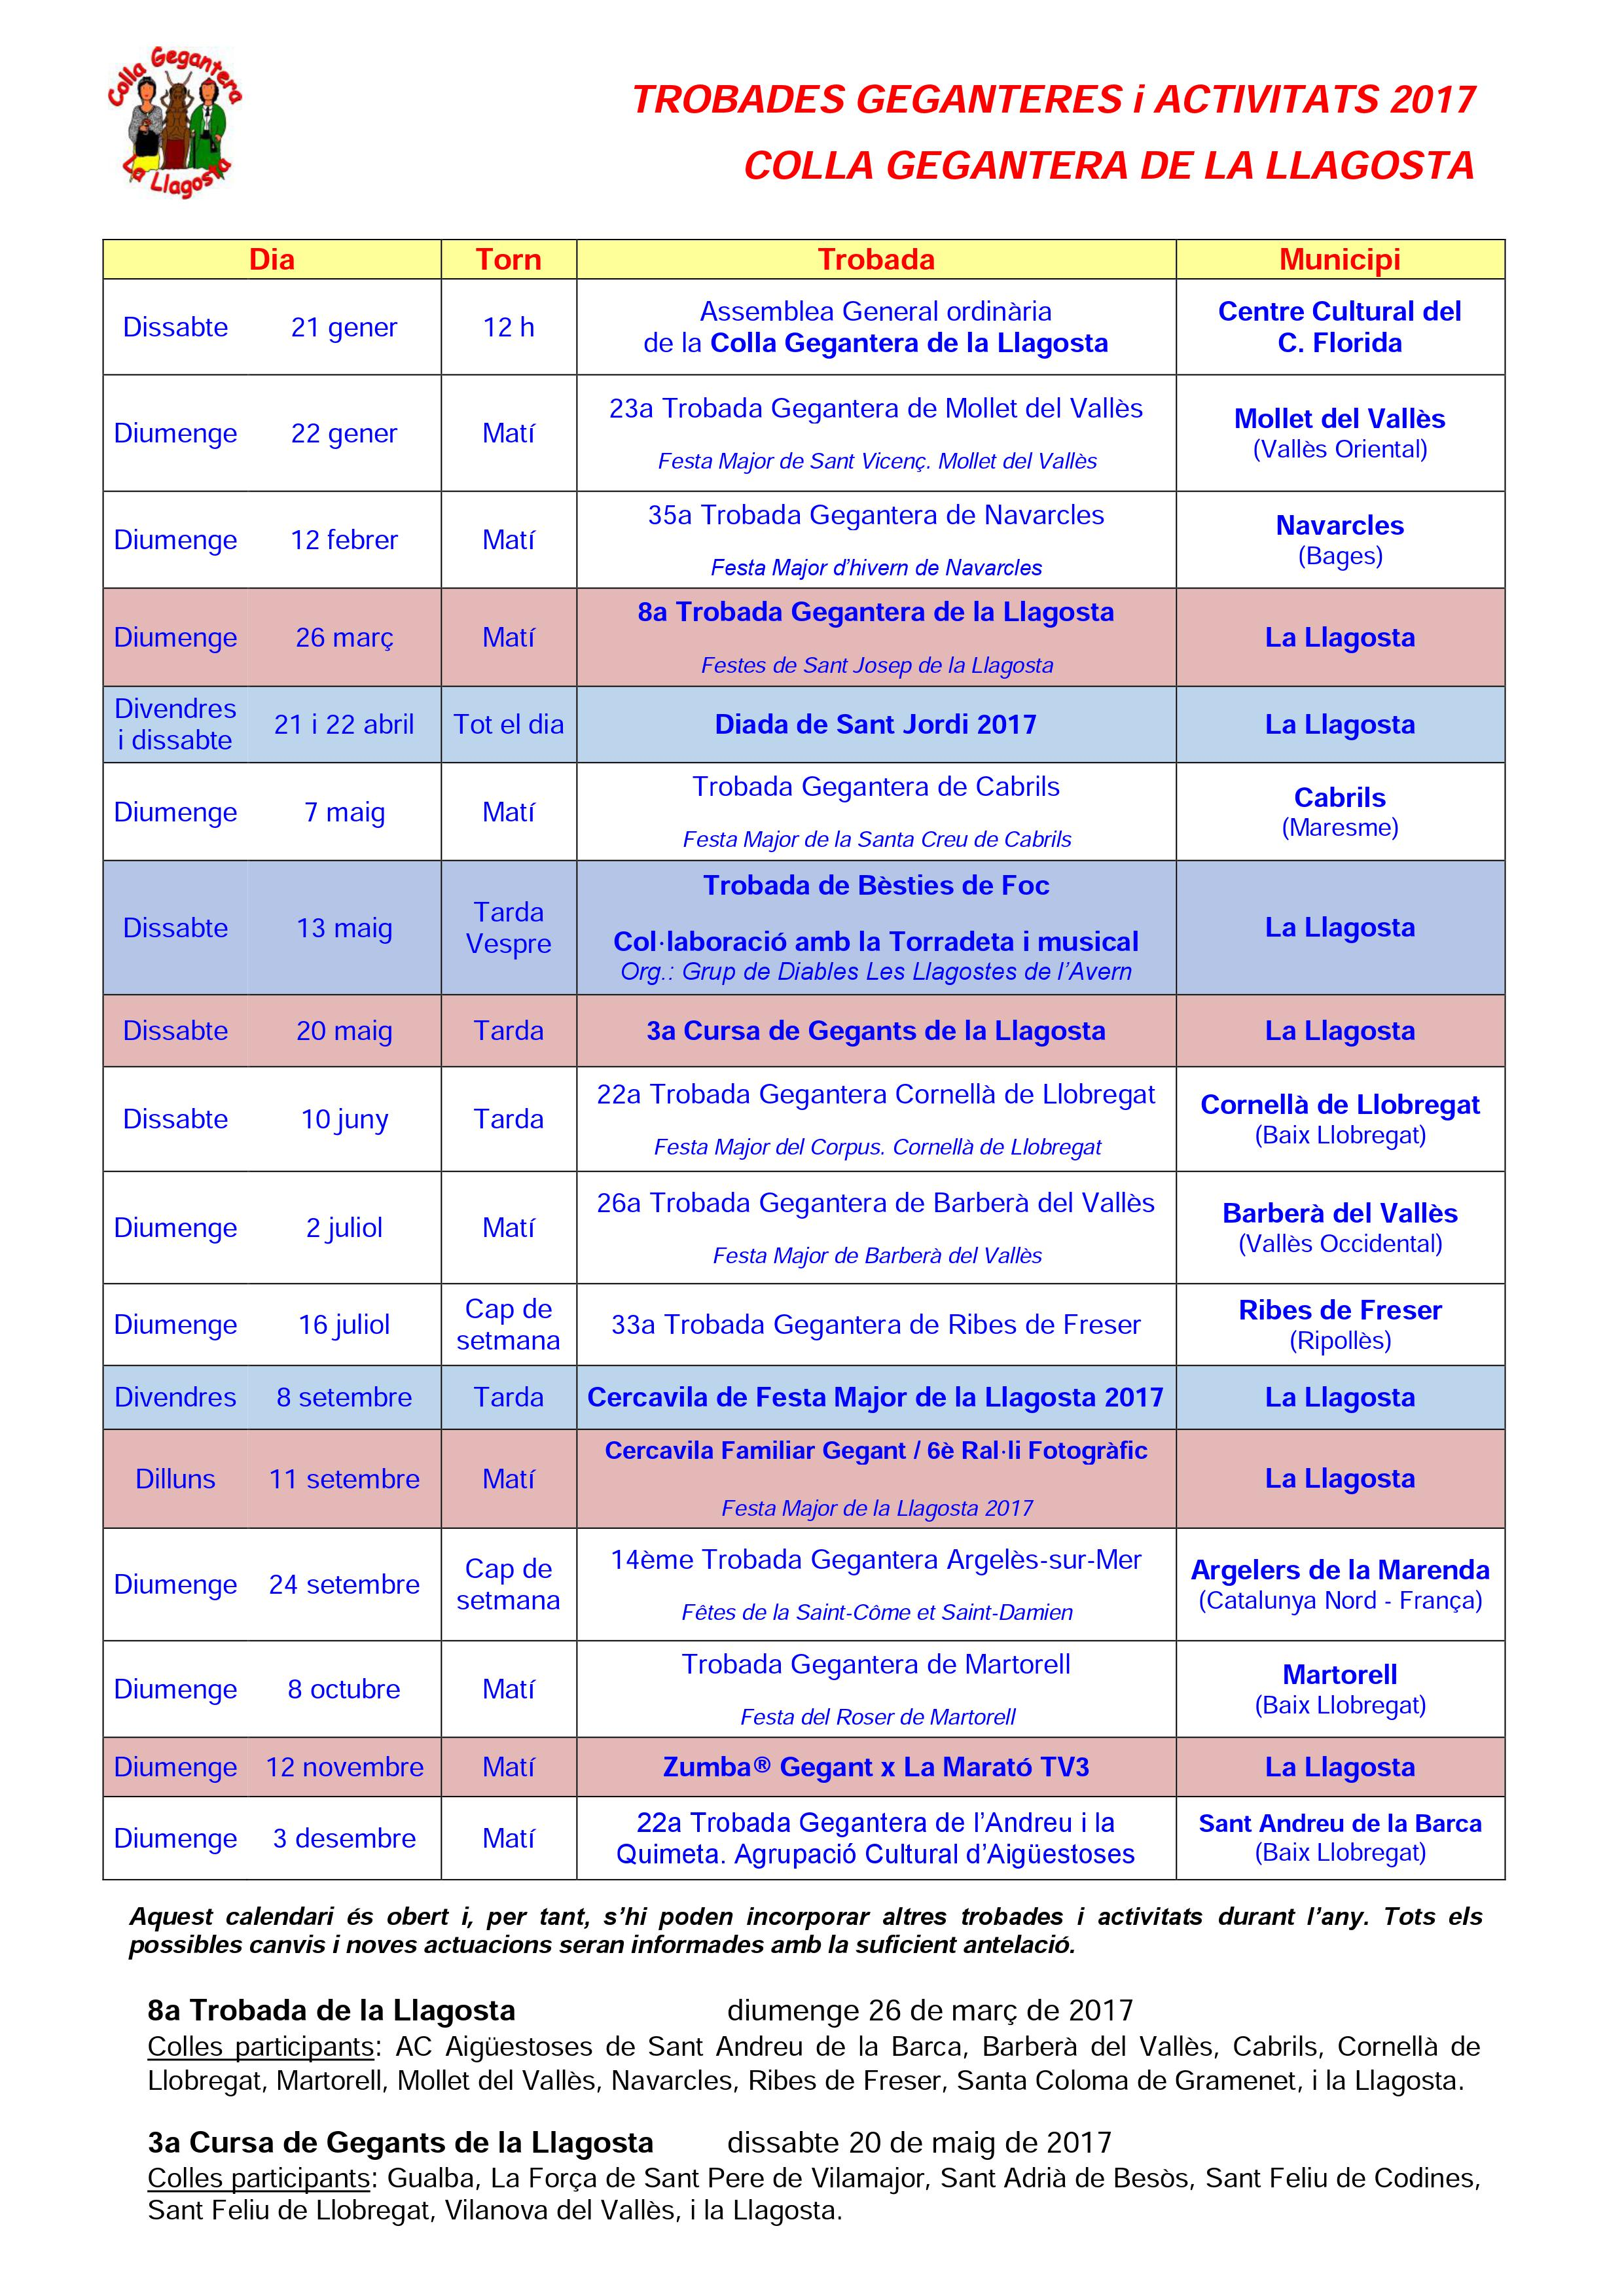 Colla Gegantera calendari 2017